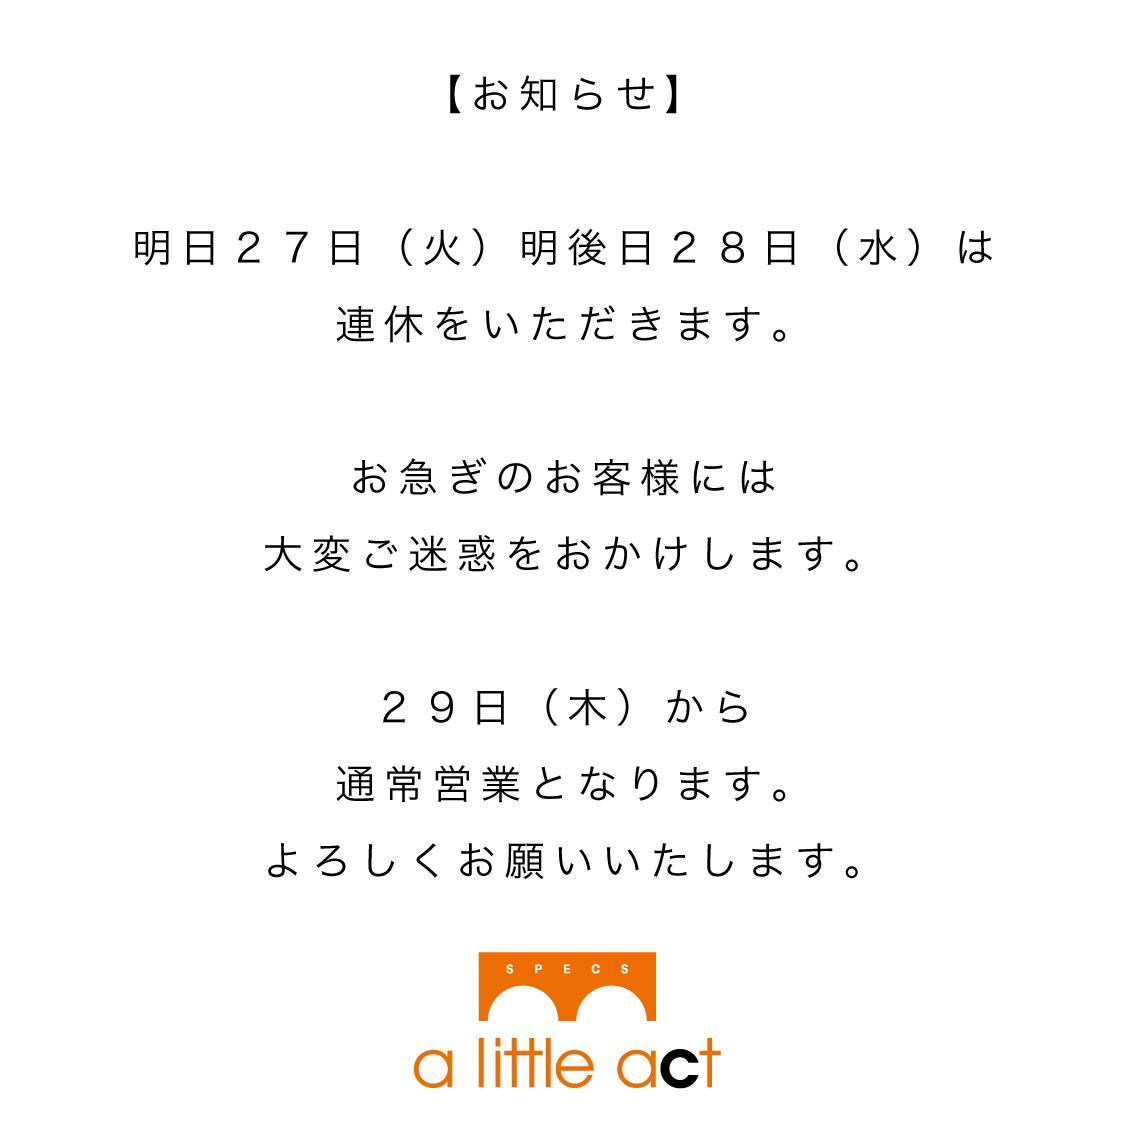 f:id:alittleact:20201026174109j:plain